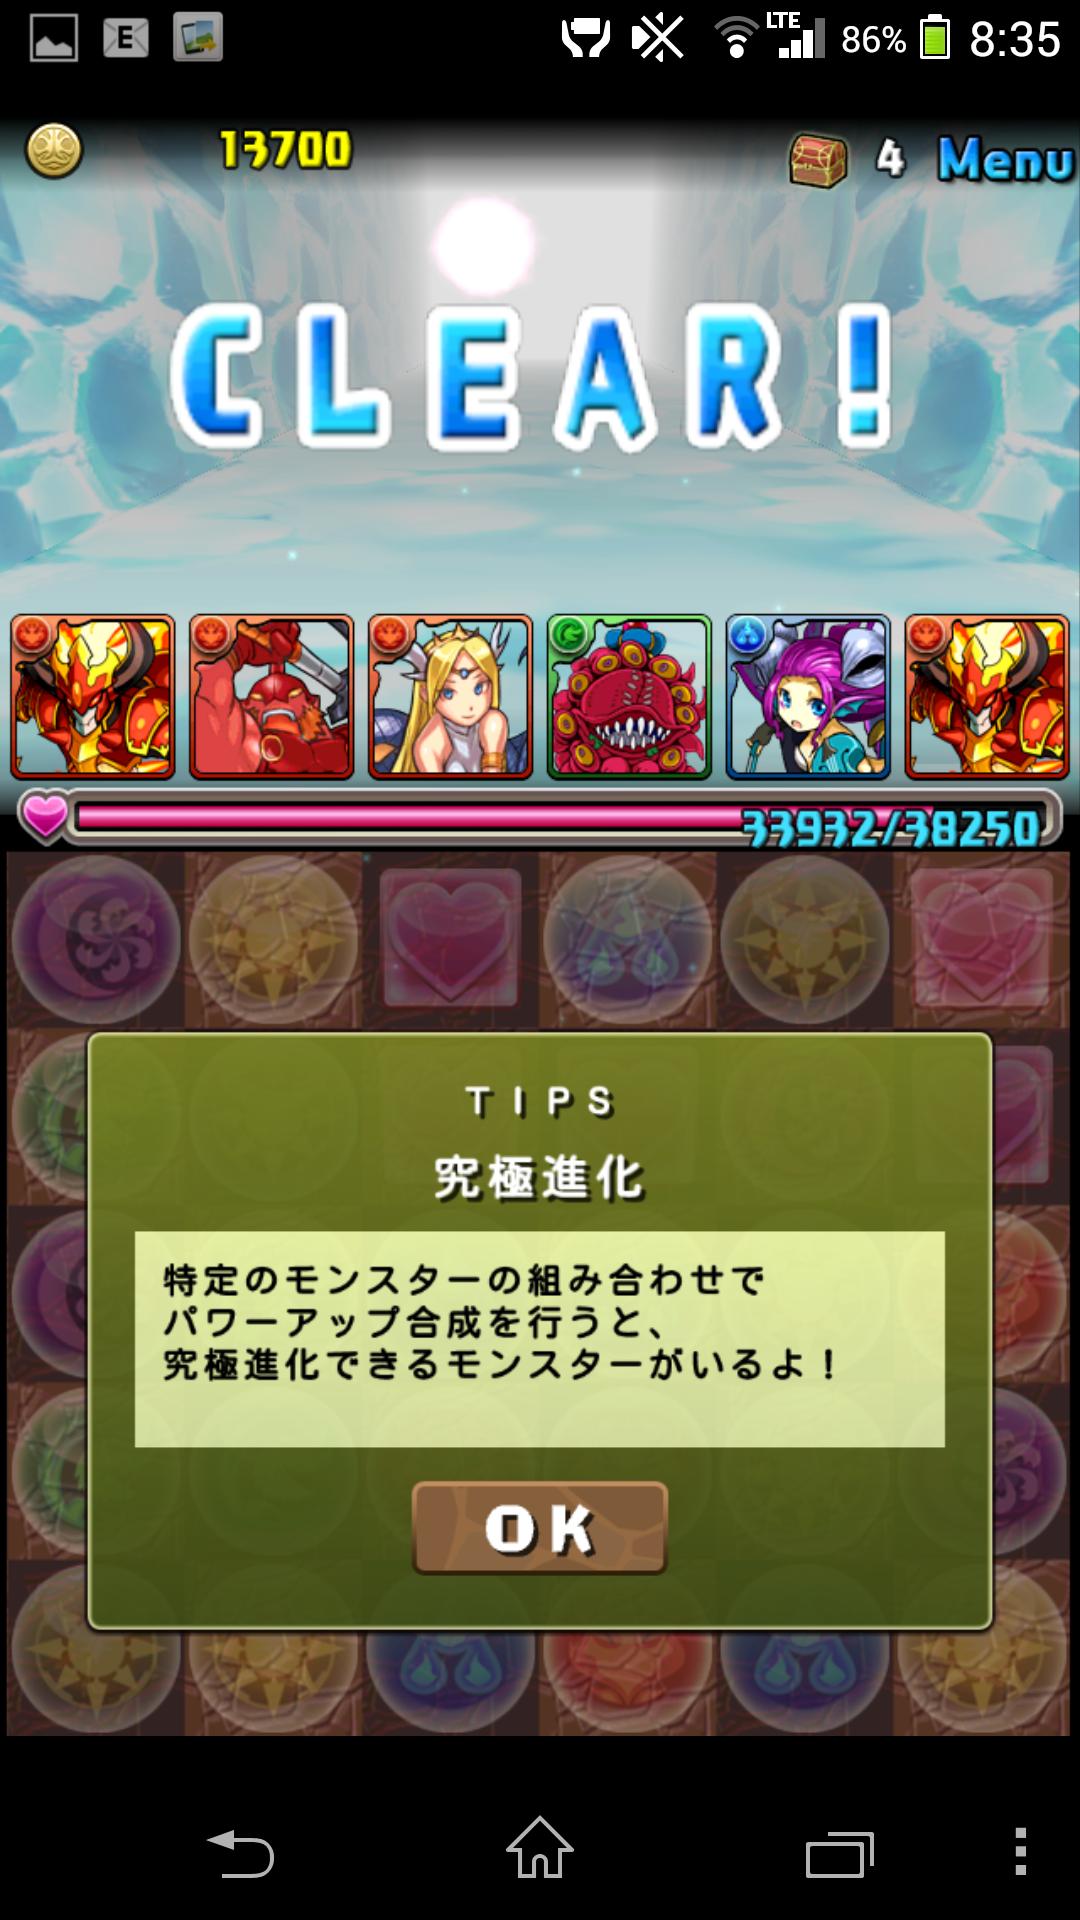 Screenshot_2014-04-04-08-35-19.png